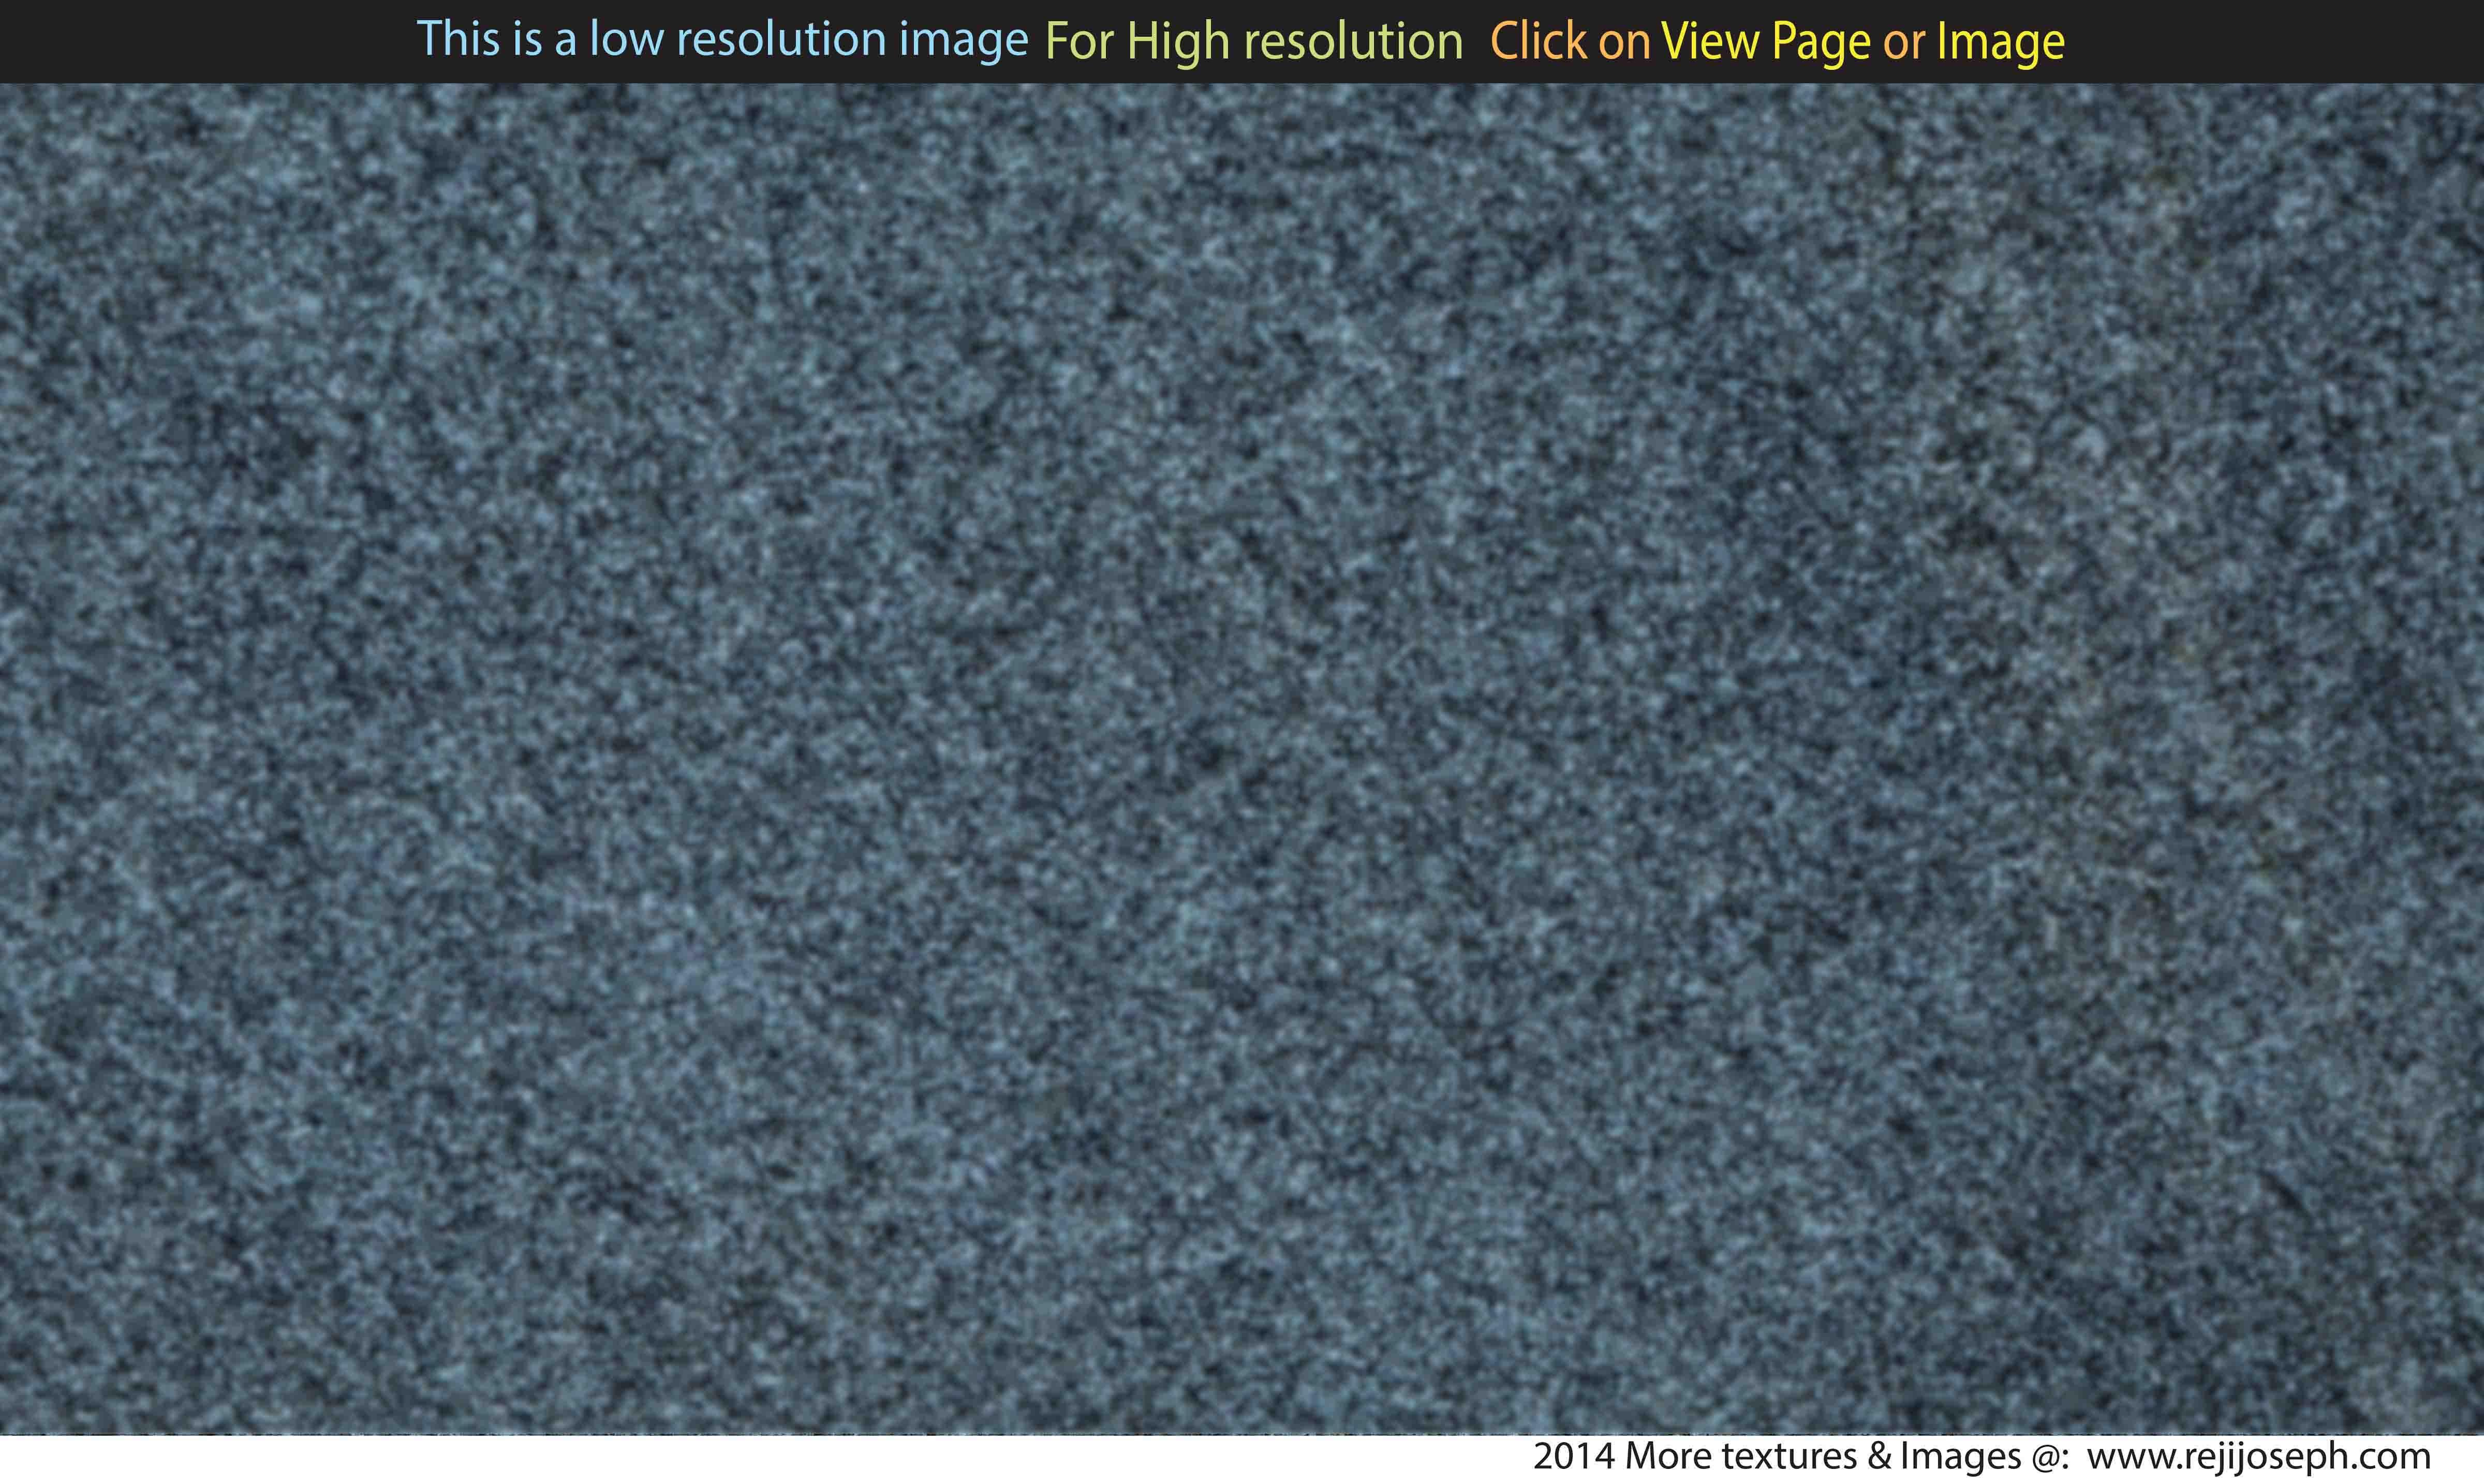 Marbles Granites Texture 00001